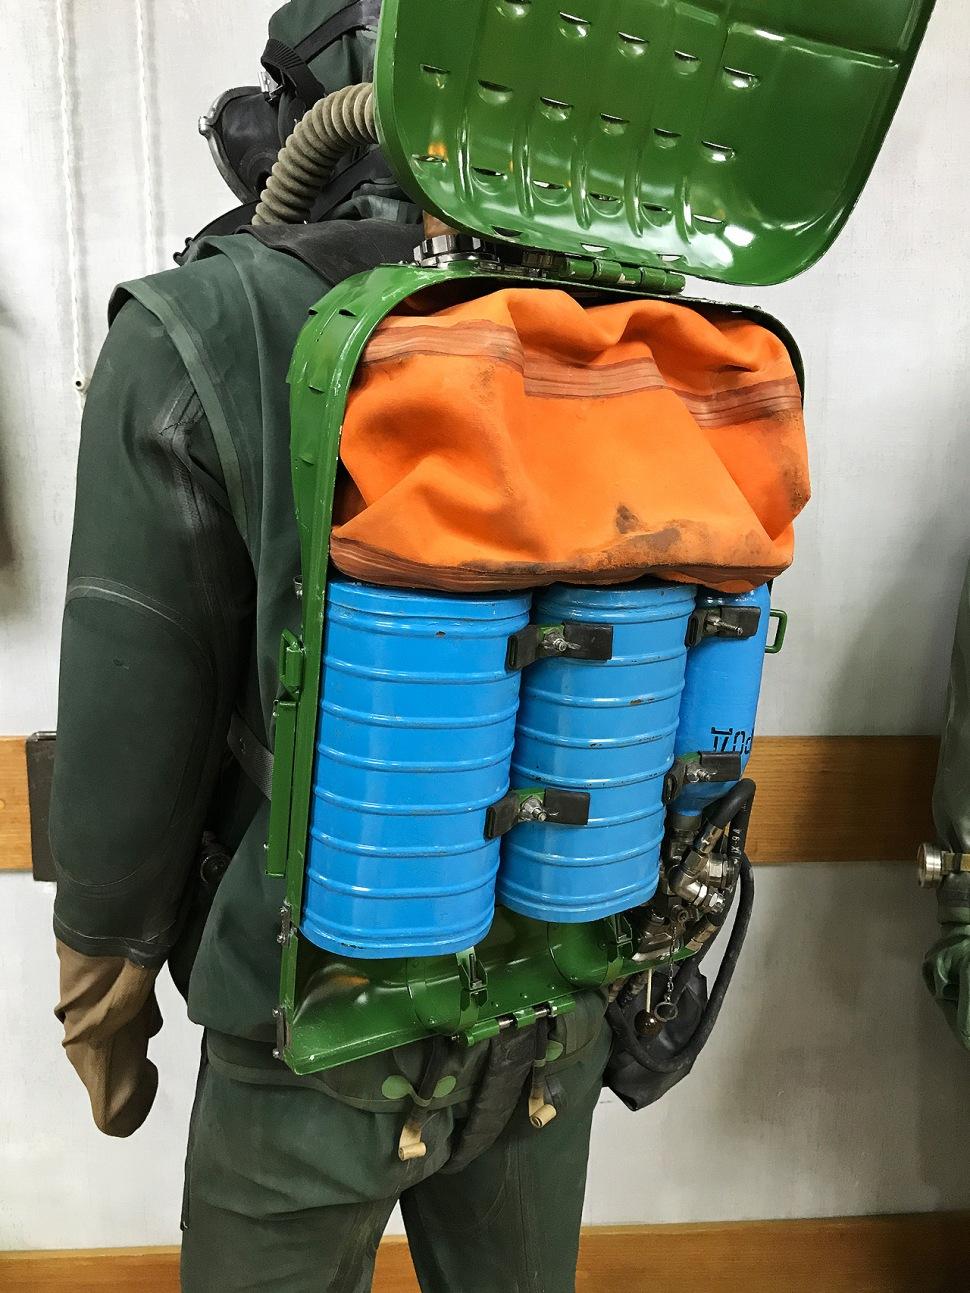 180627-panerai-gtg-moscow-paneristi-club-room-rebreather-IDA-71-open